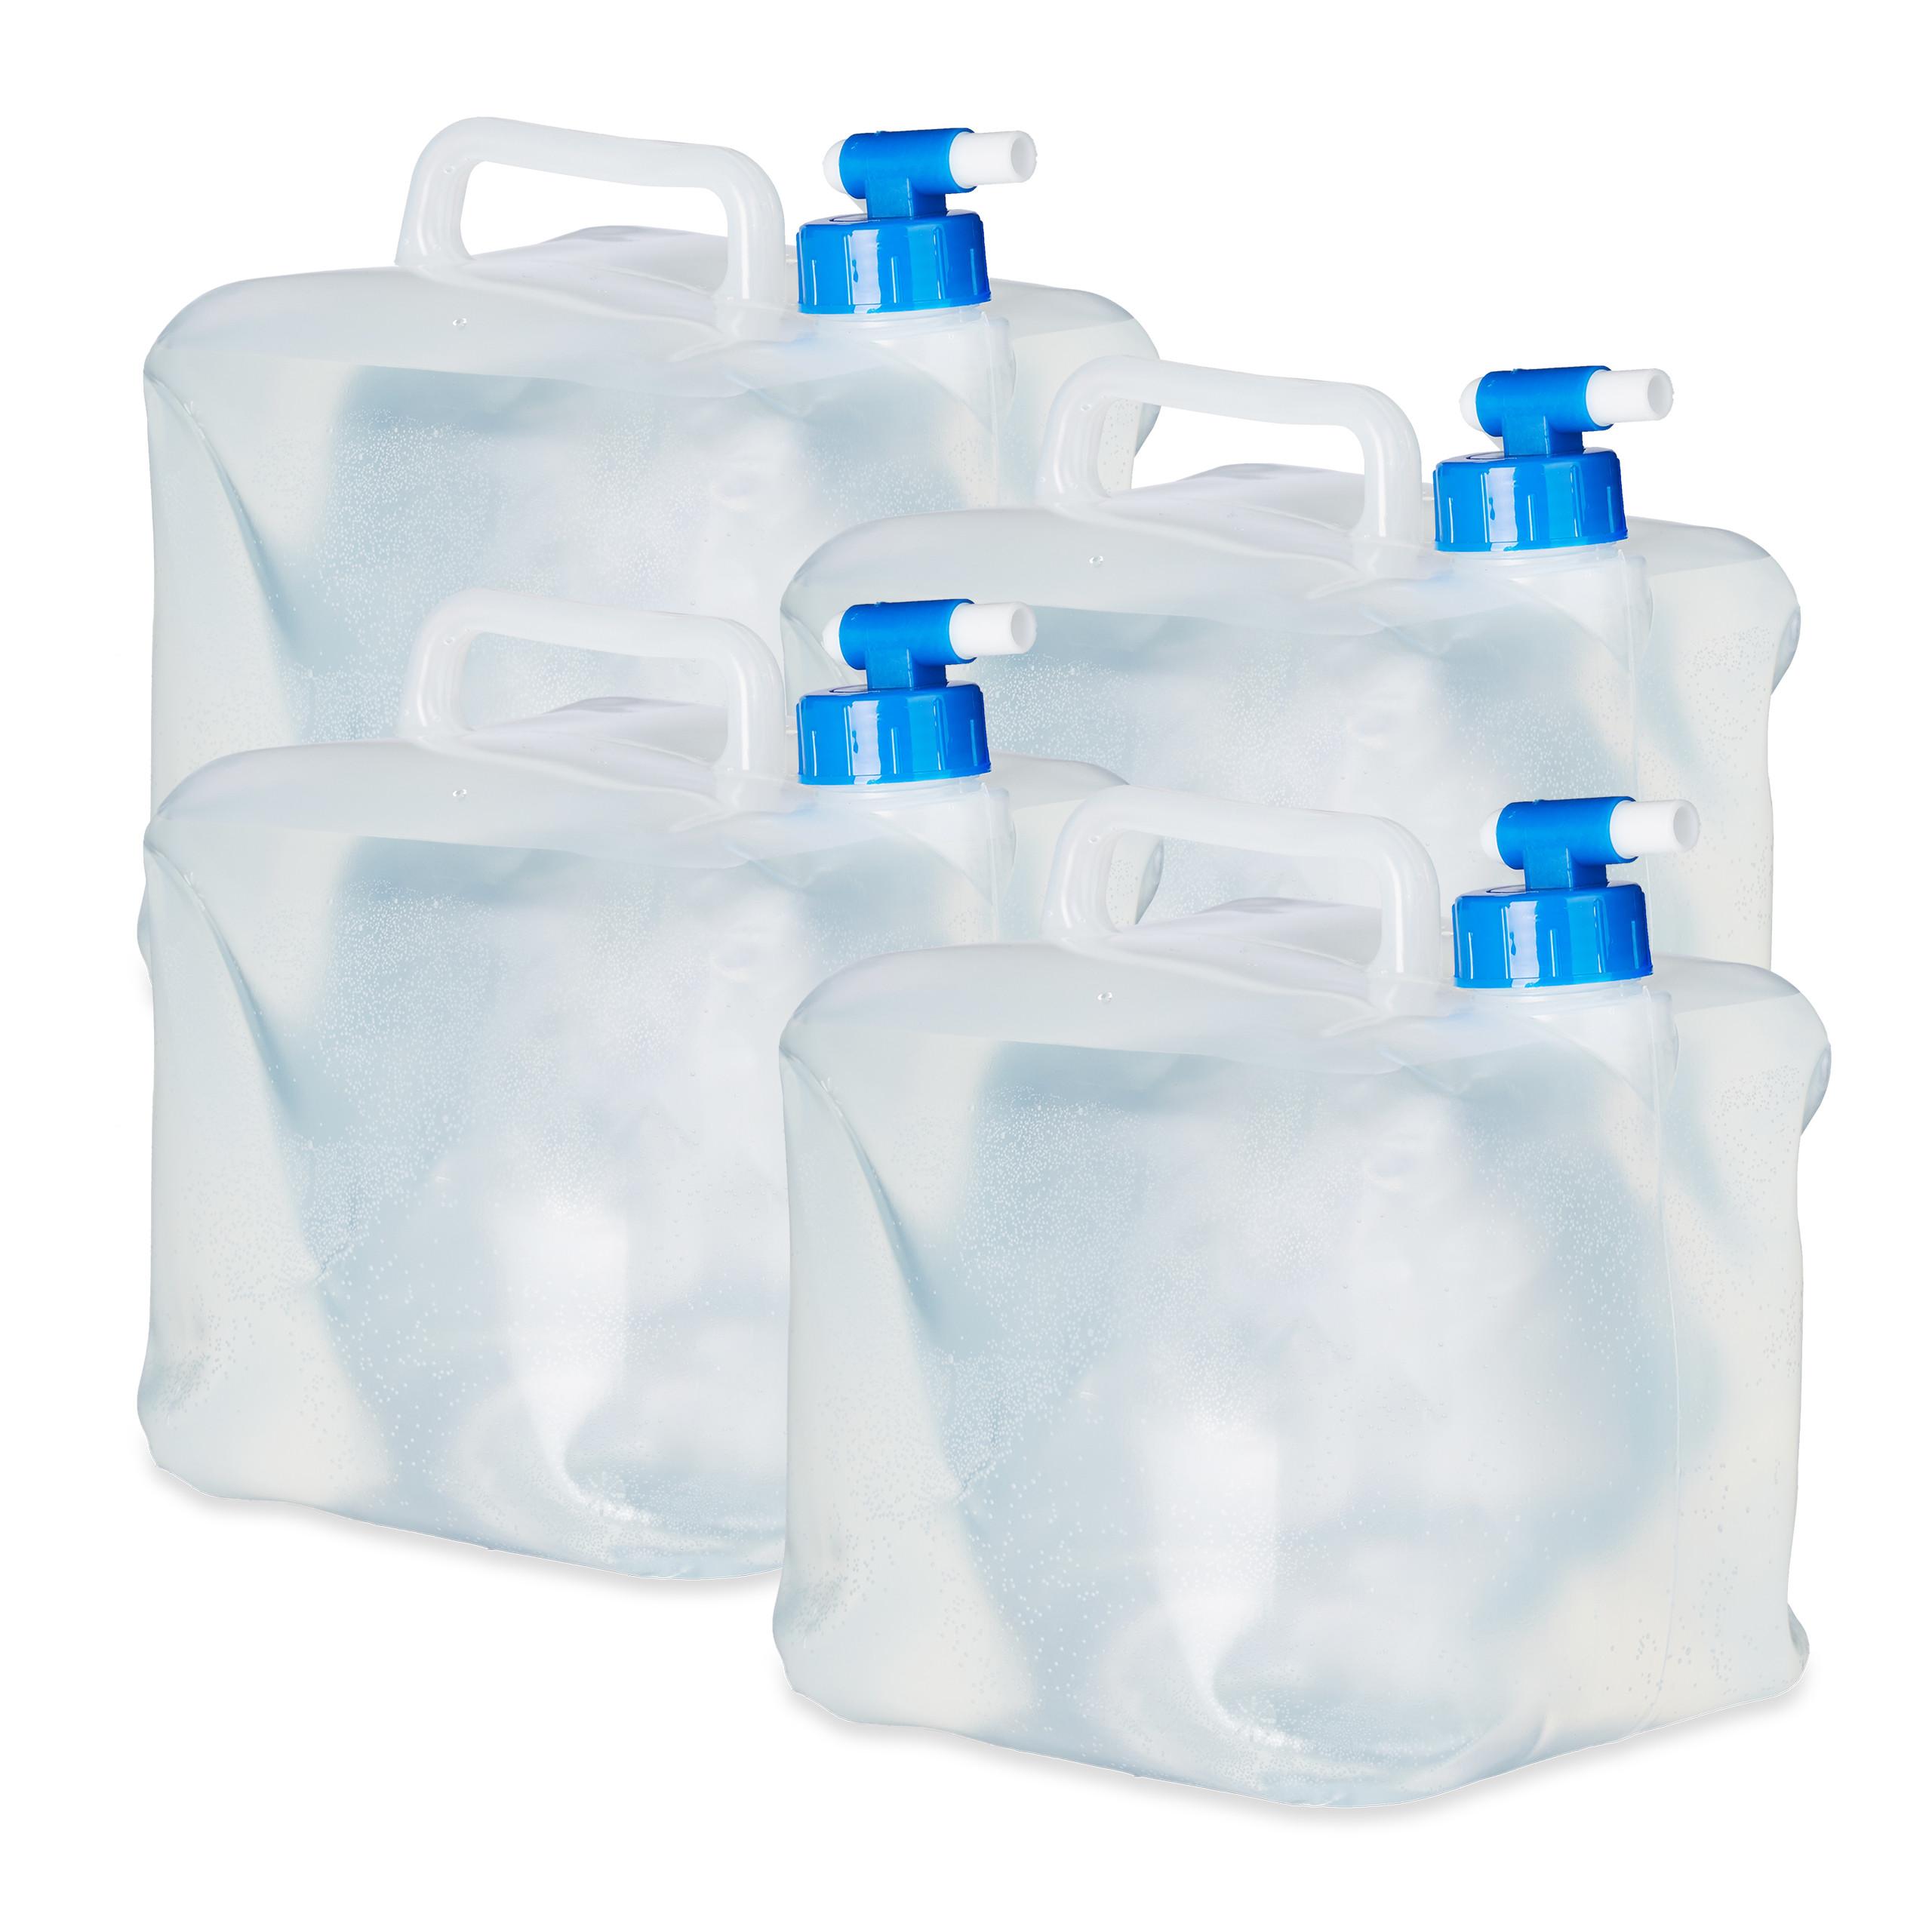 Wasserkanister faltbar 4 Stück Faltkanister Trinkwasser Campingkanister BPA frei